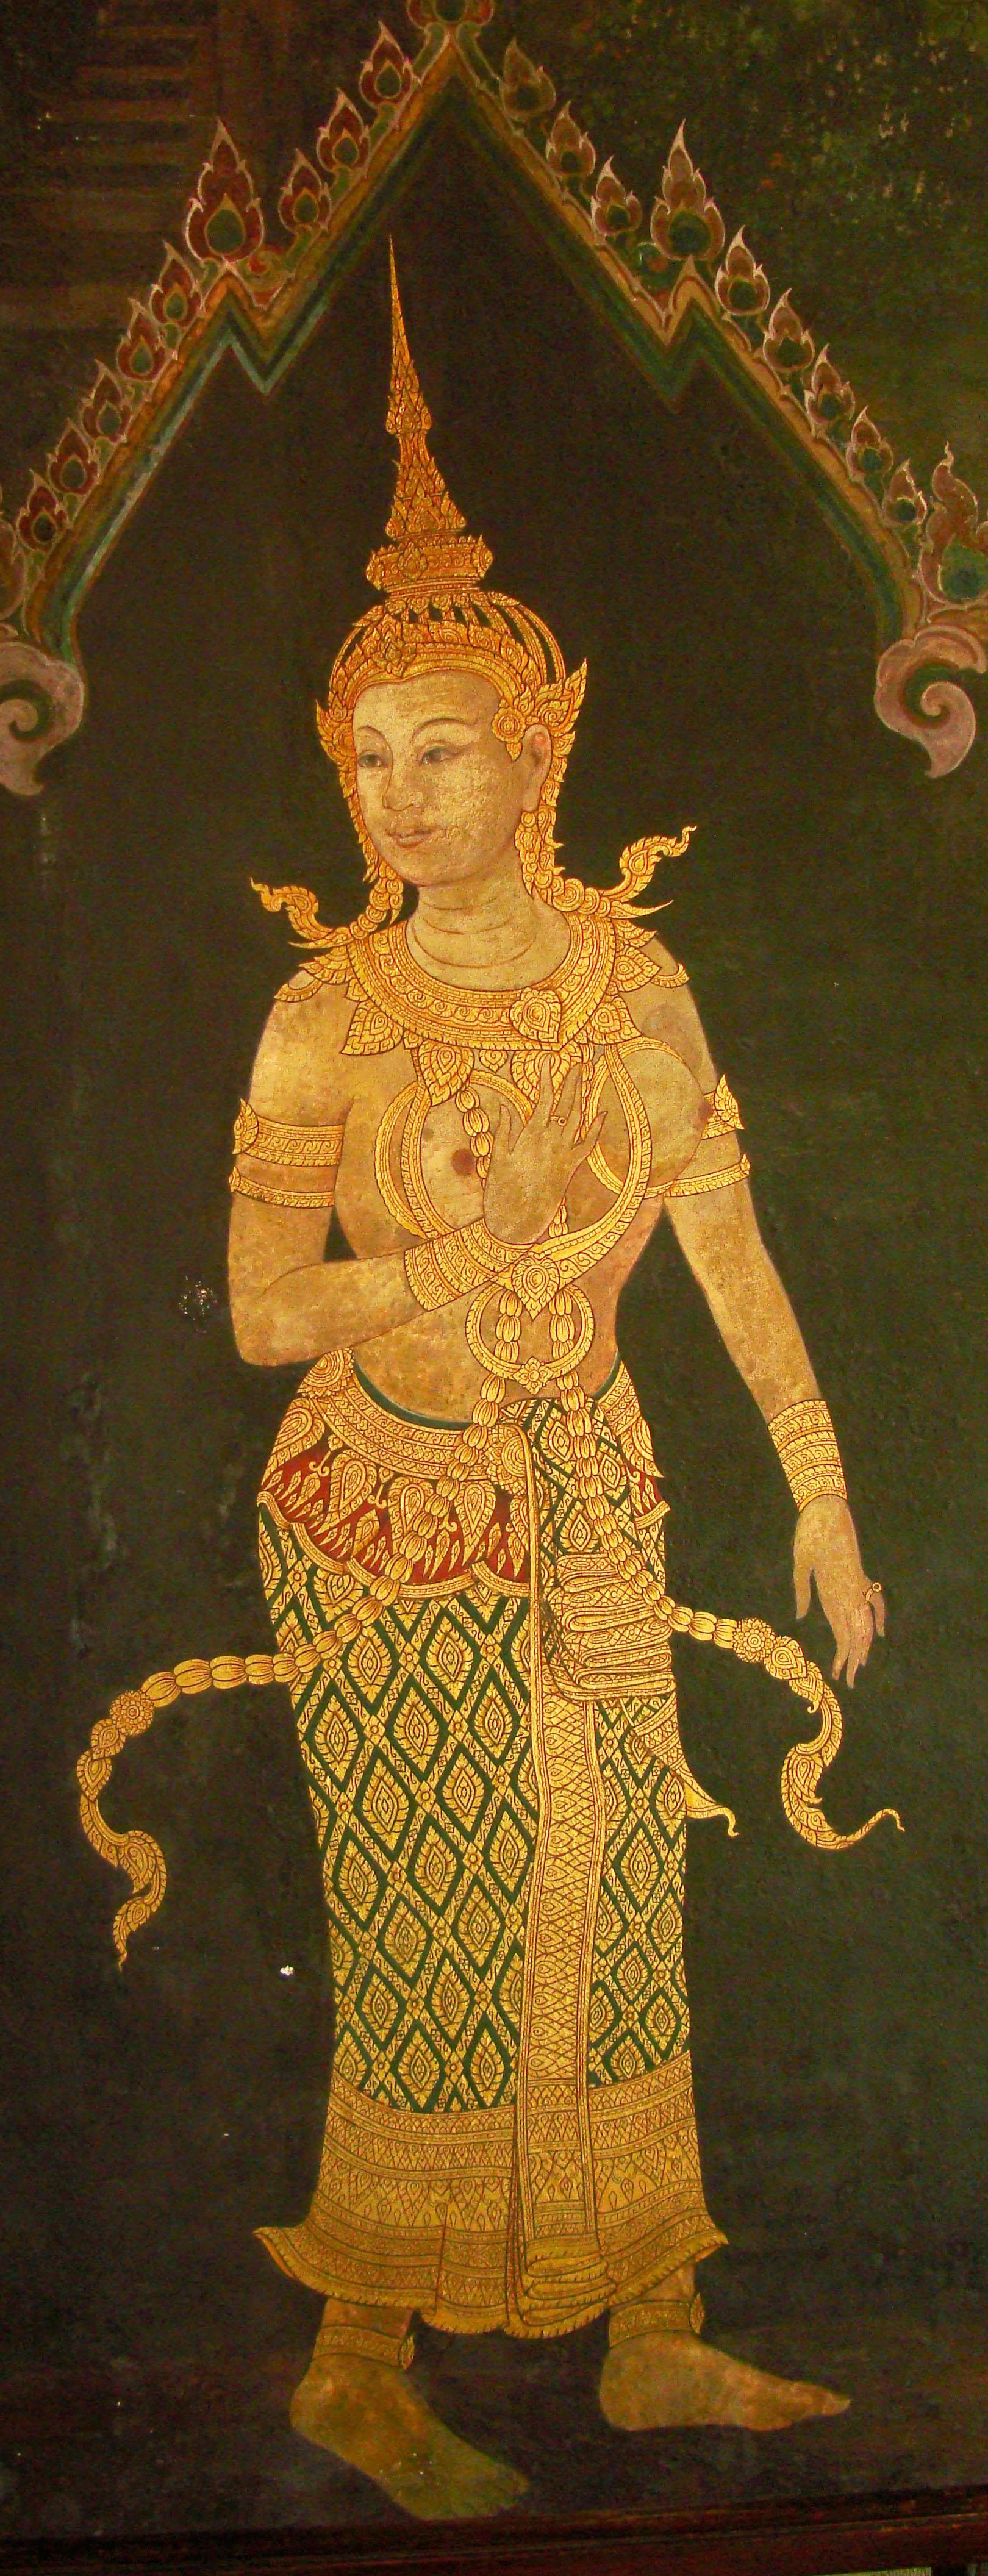 Grand Palace temple doors Gold leaf Buddhist paintings Bangkok Thailand 10